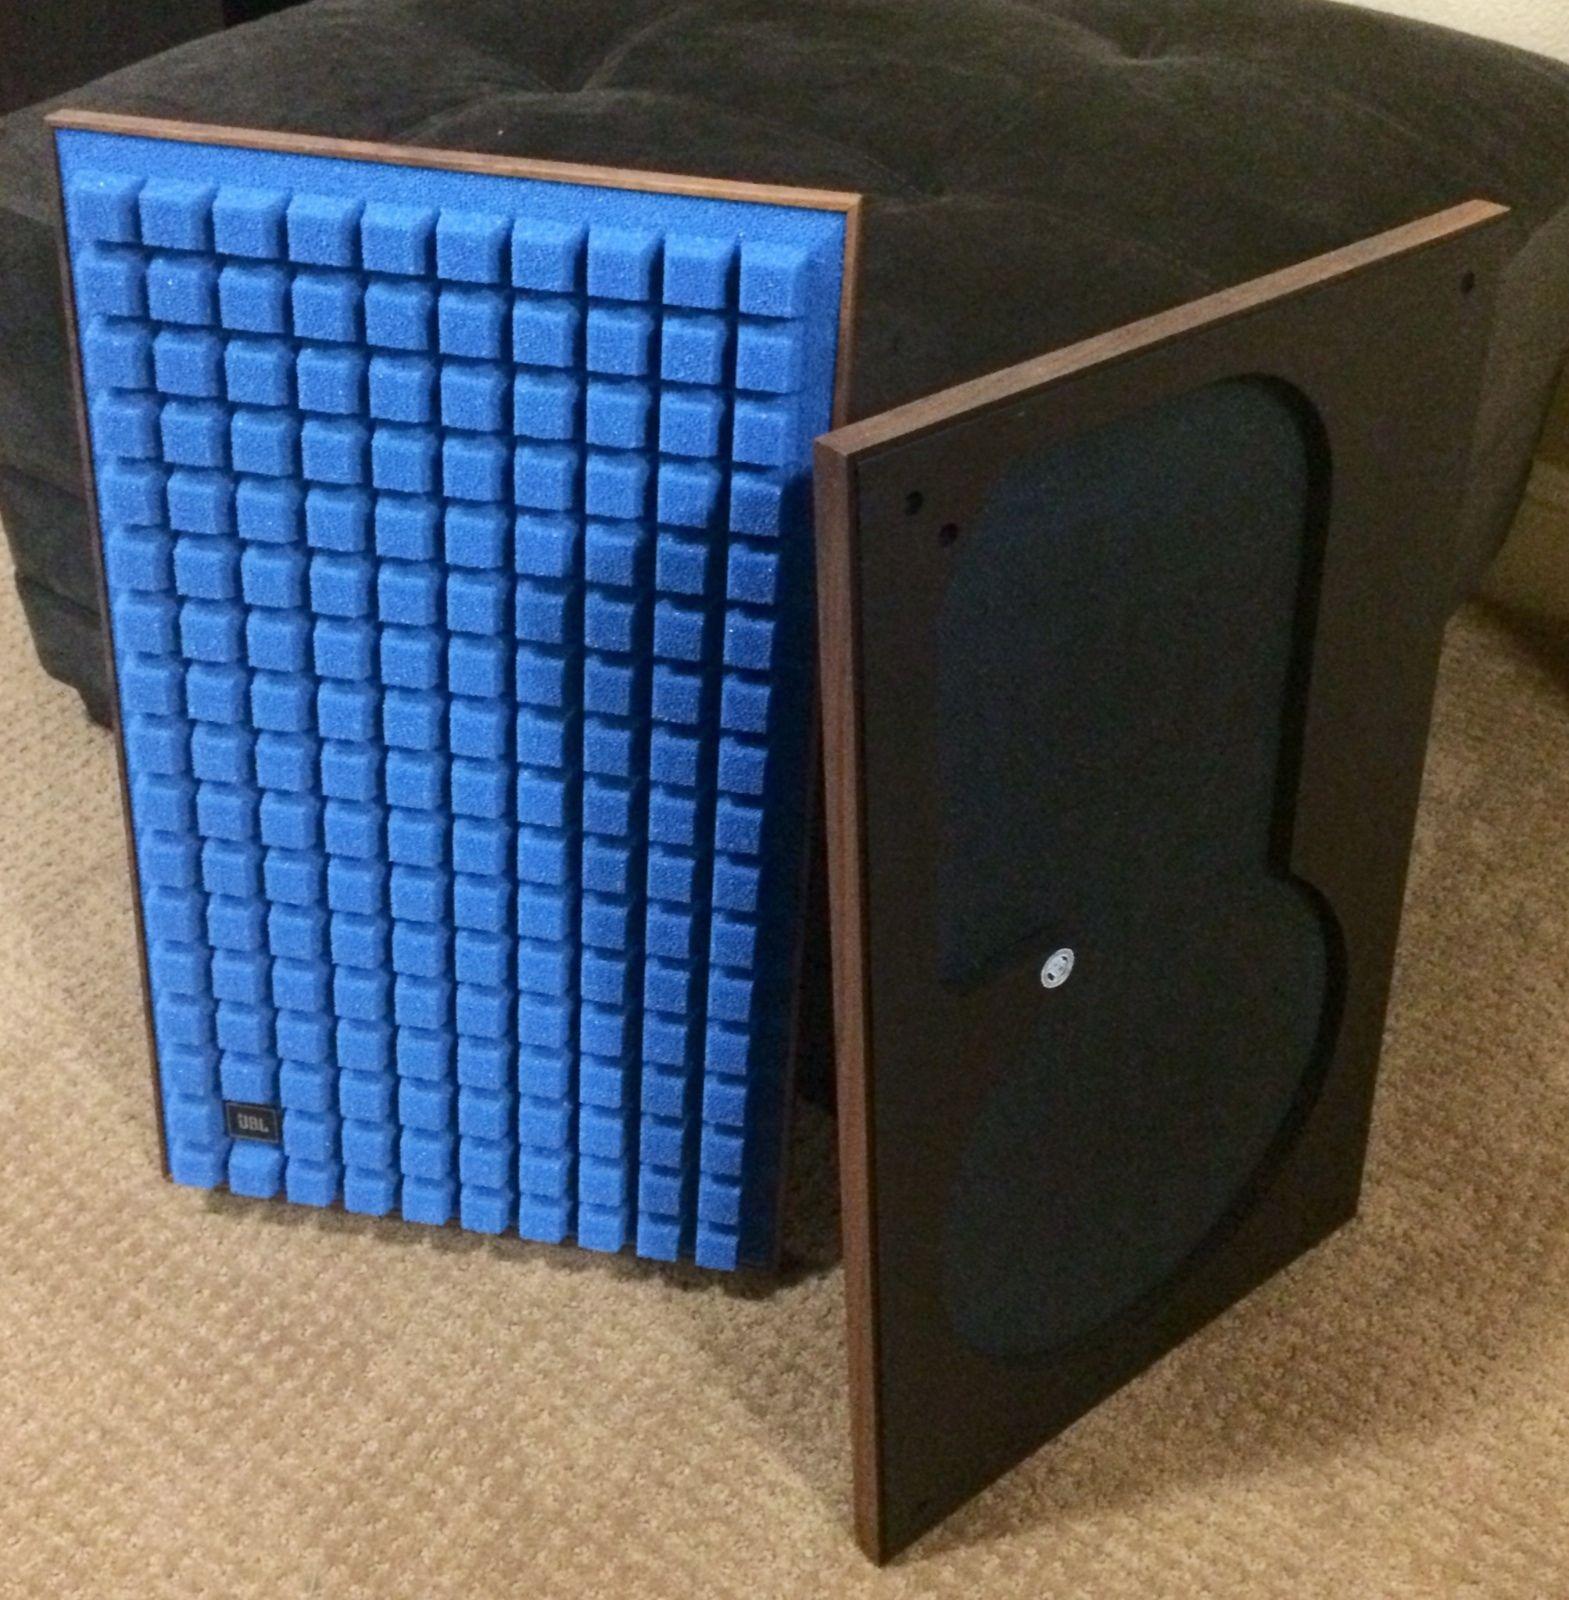 Pair Of Perfect Reproduction Speaker Grilles For Jbl L100